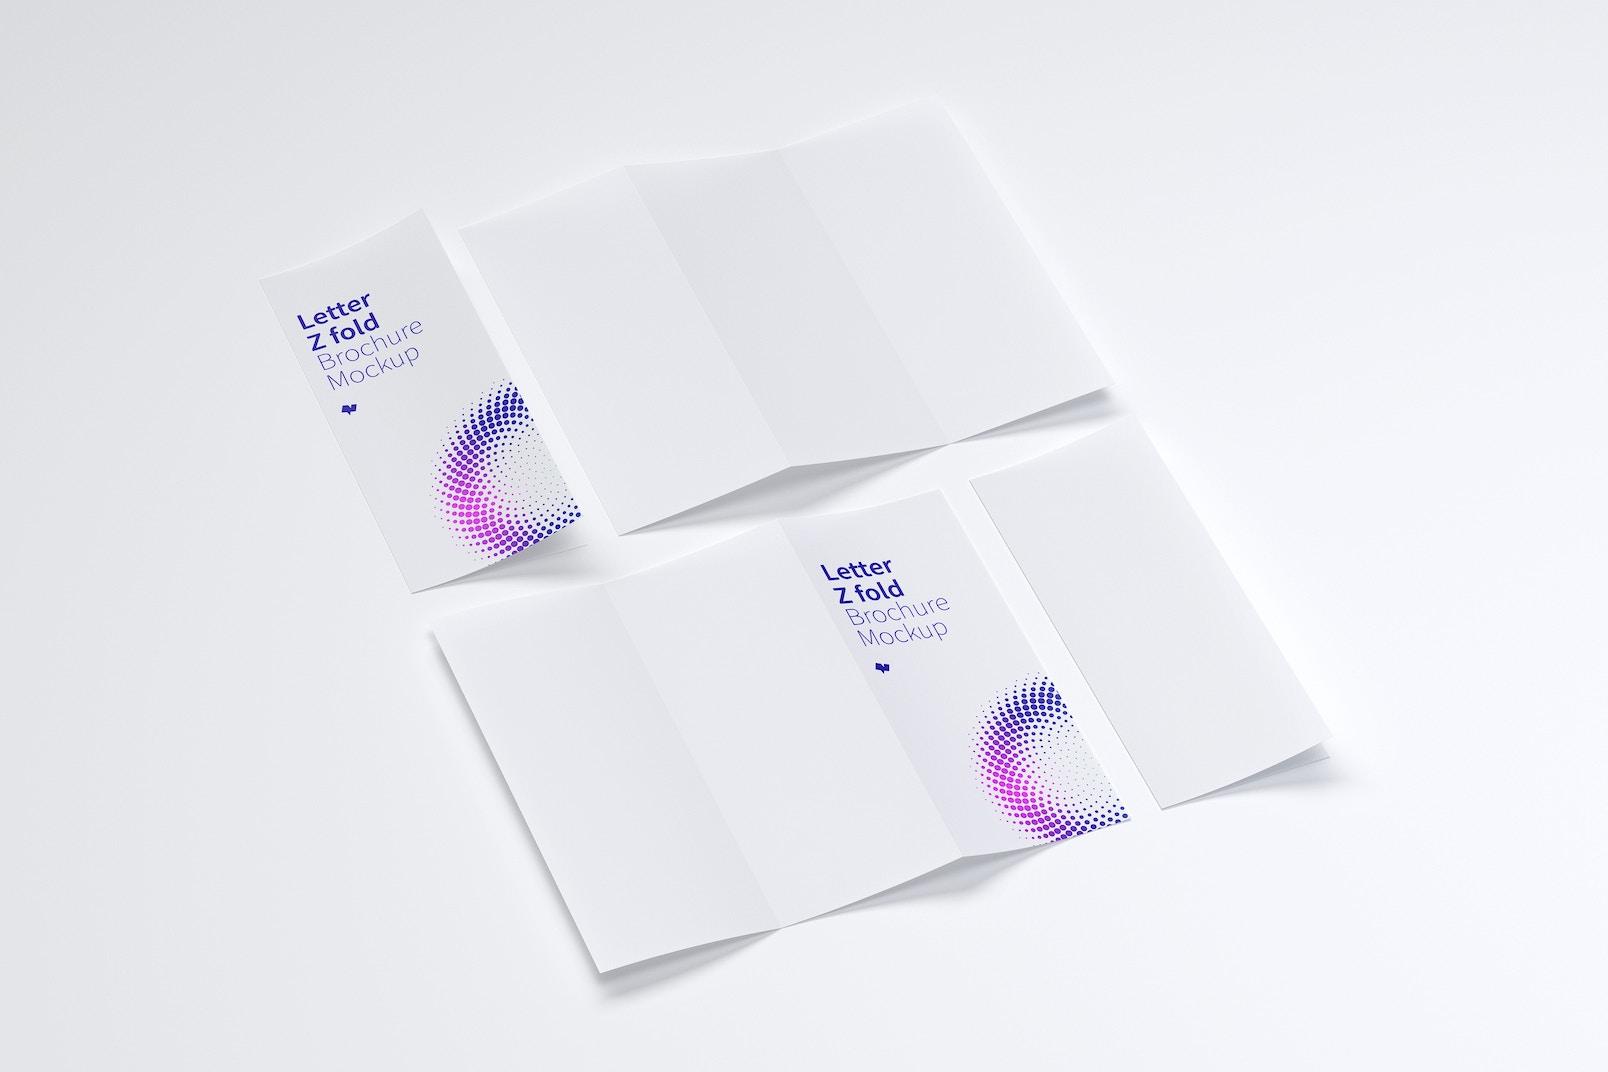 Letter Z Fold Brochure Mockup 04